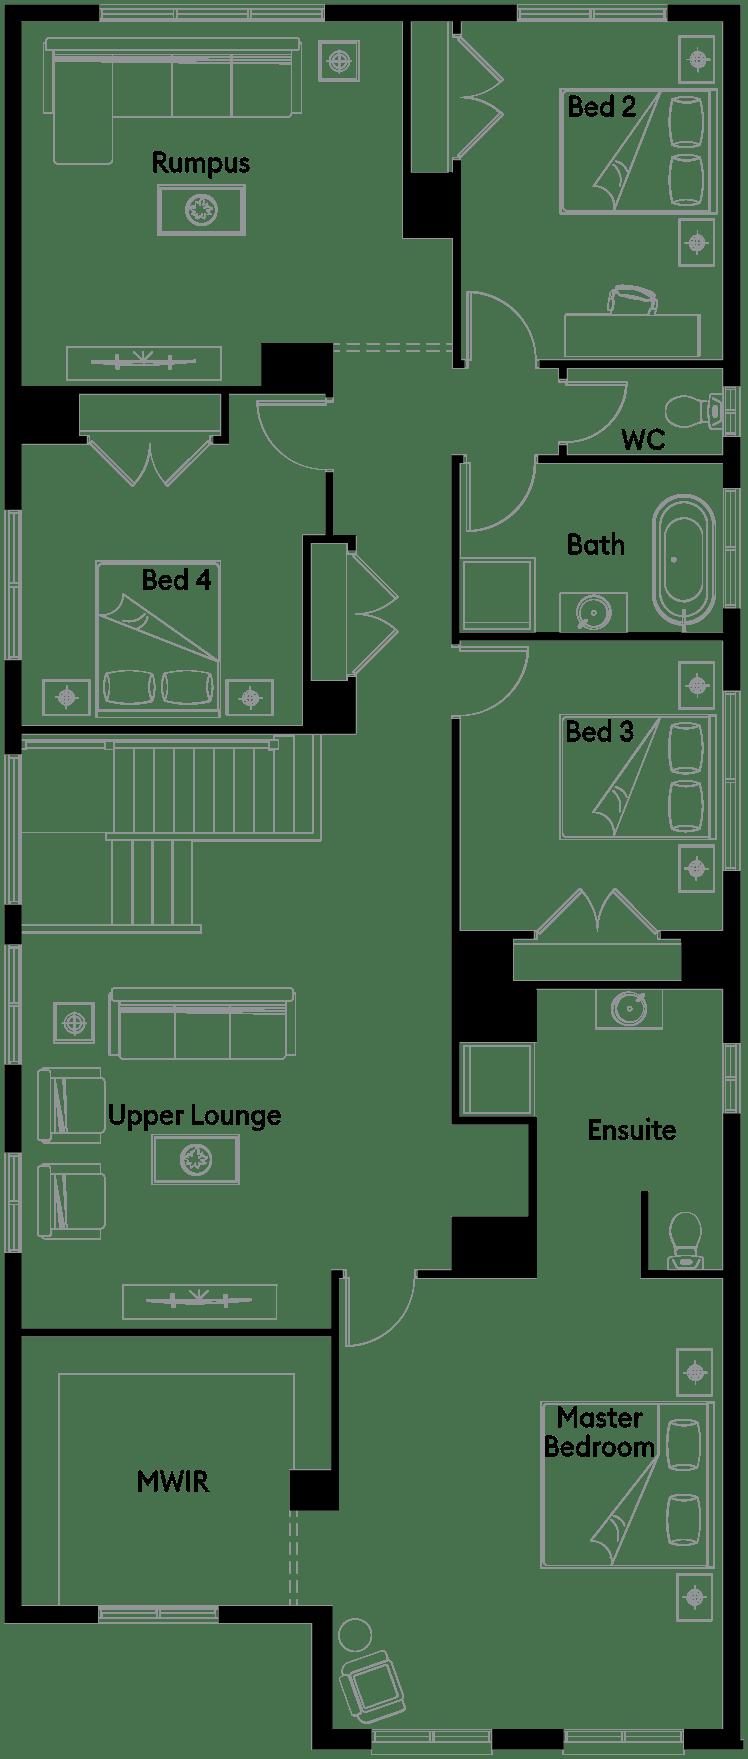 FloorPlan2_HOUSE769_Stanhope_41-02-5